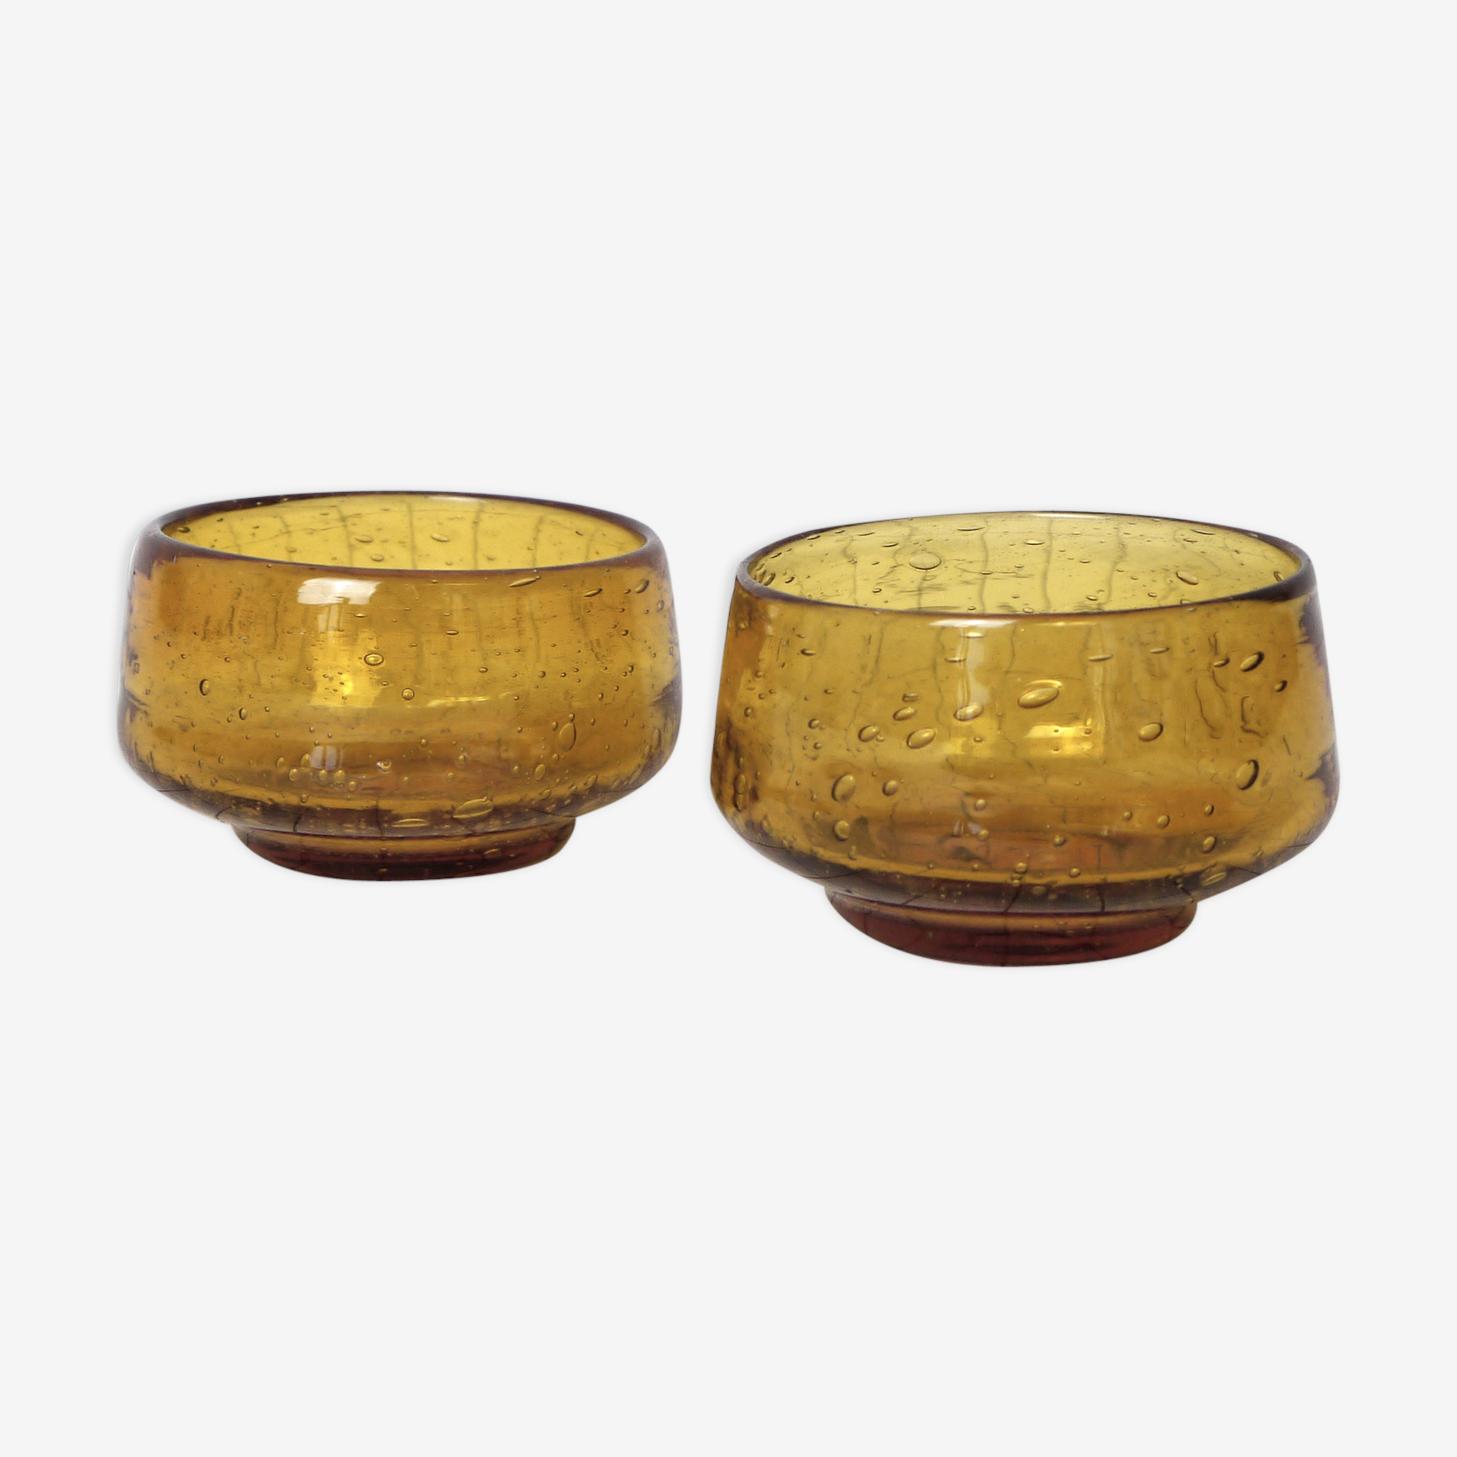 Two yellow bubble glass bowls